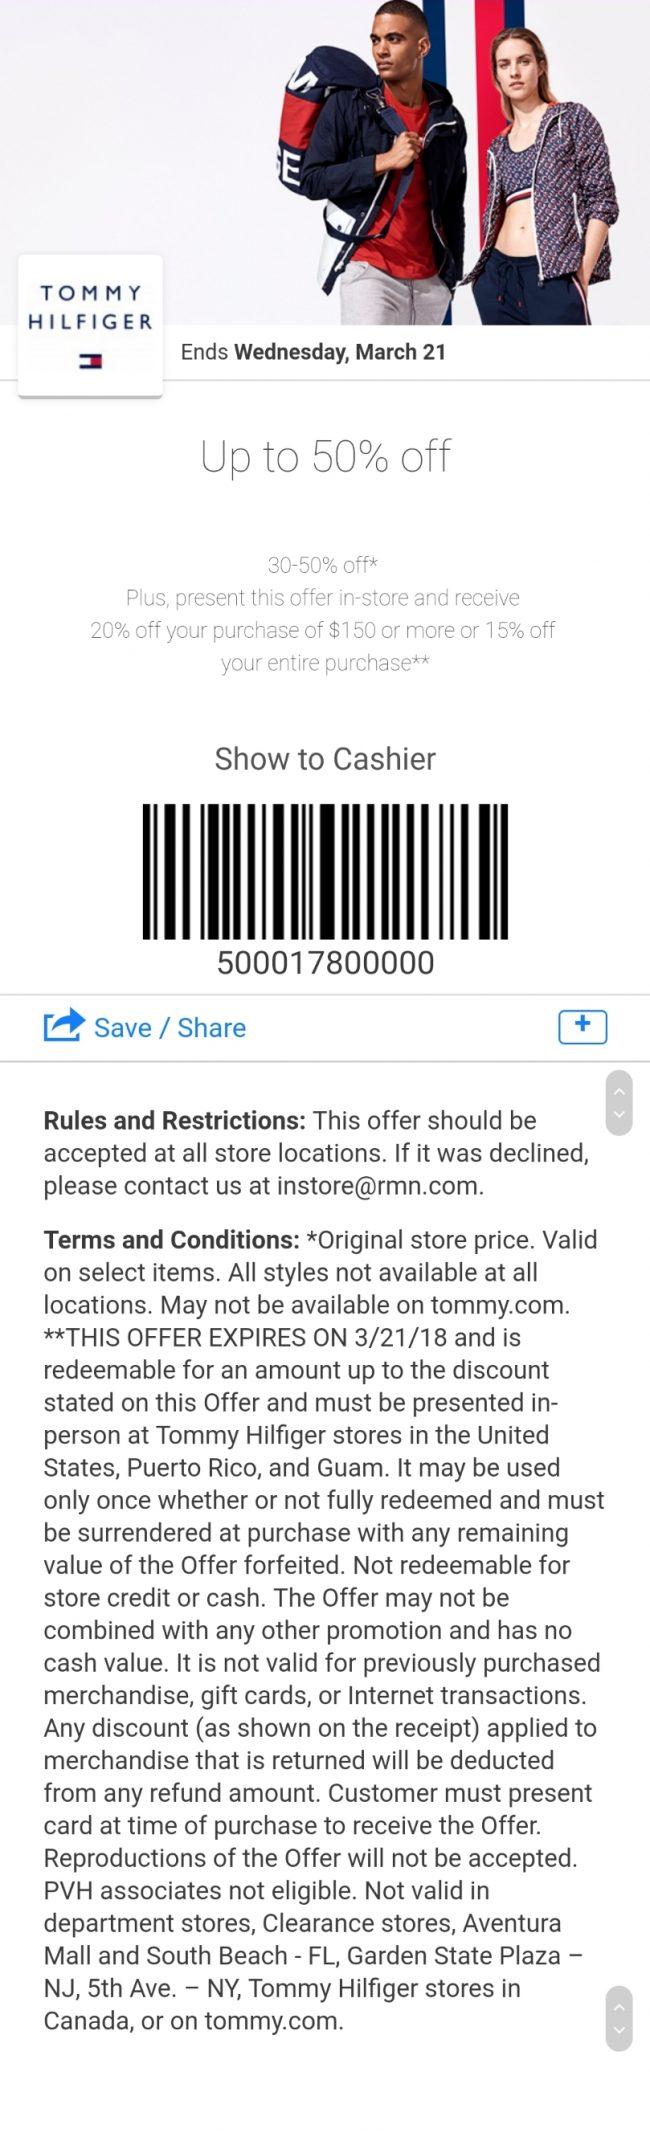 Screenshot 20180302 090213 650x2133 - Cupons de Desconto